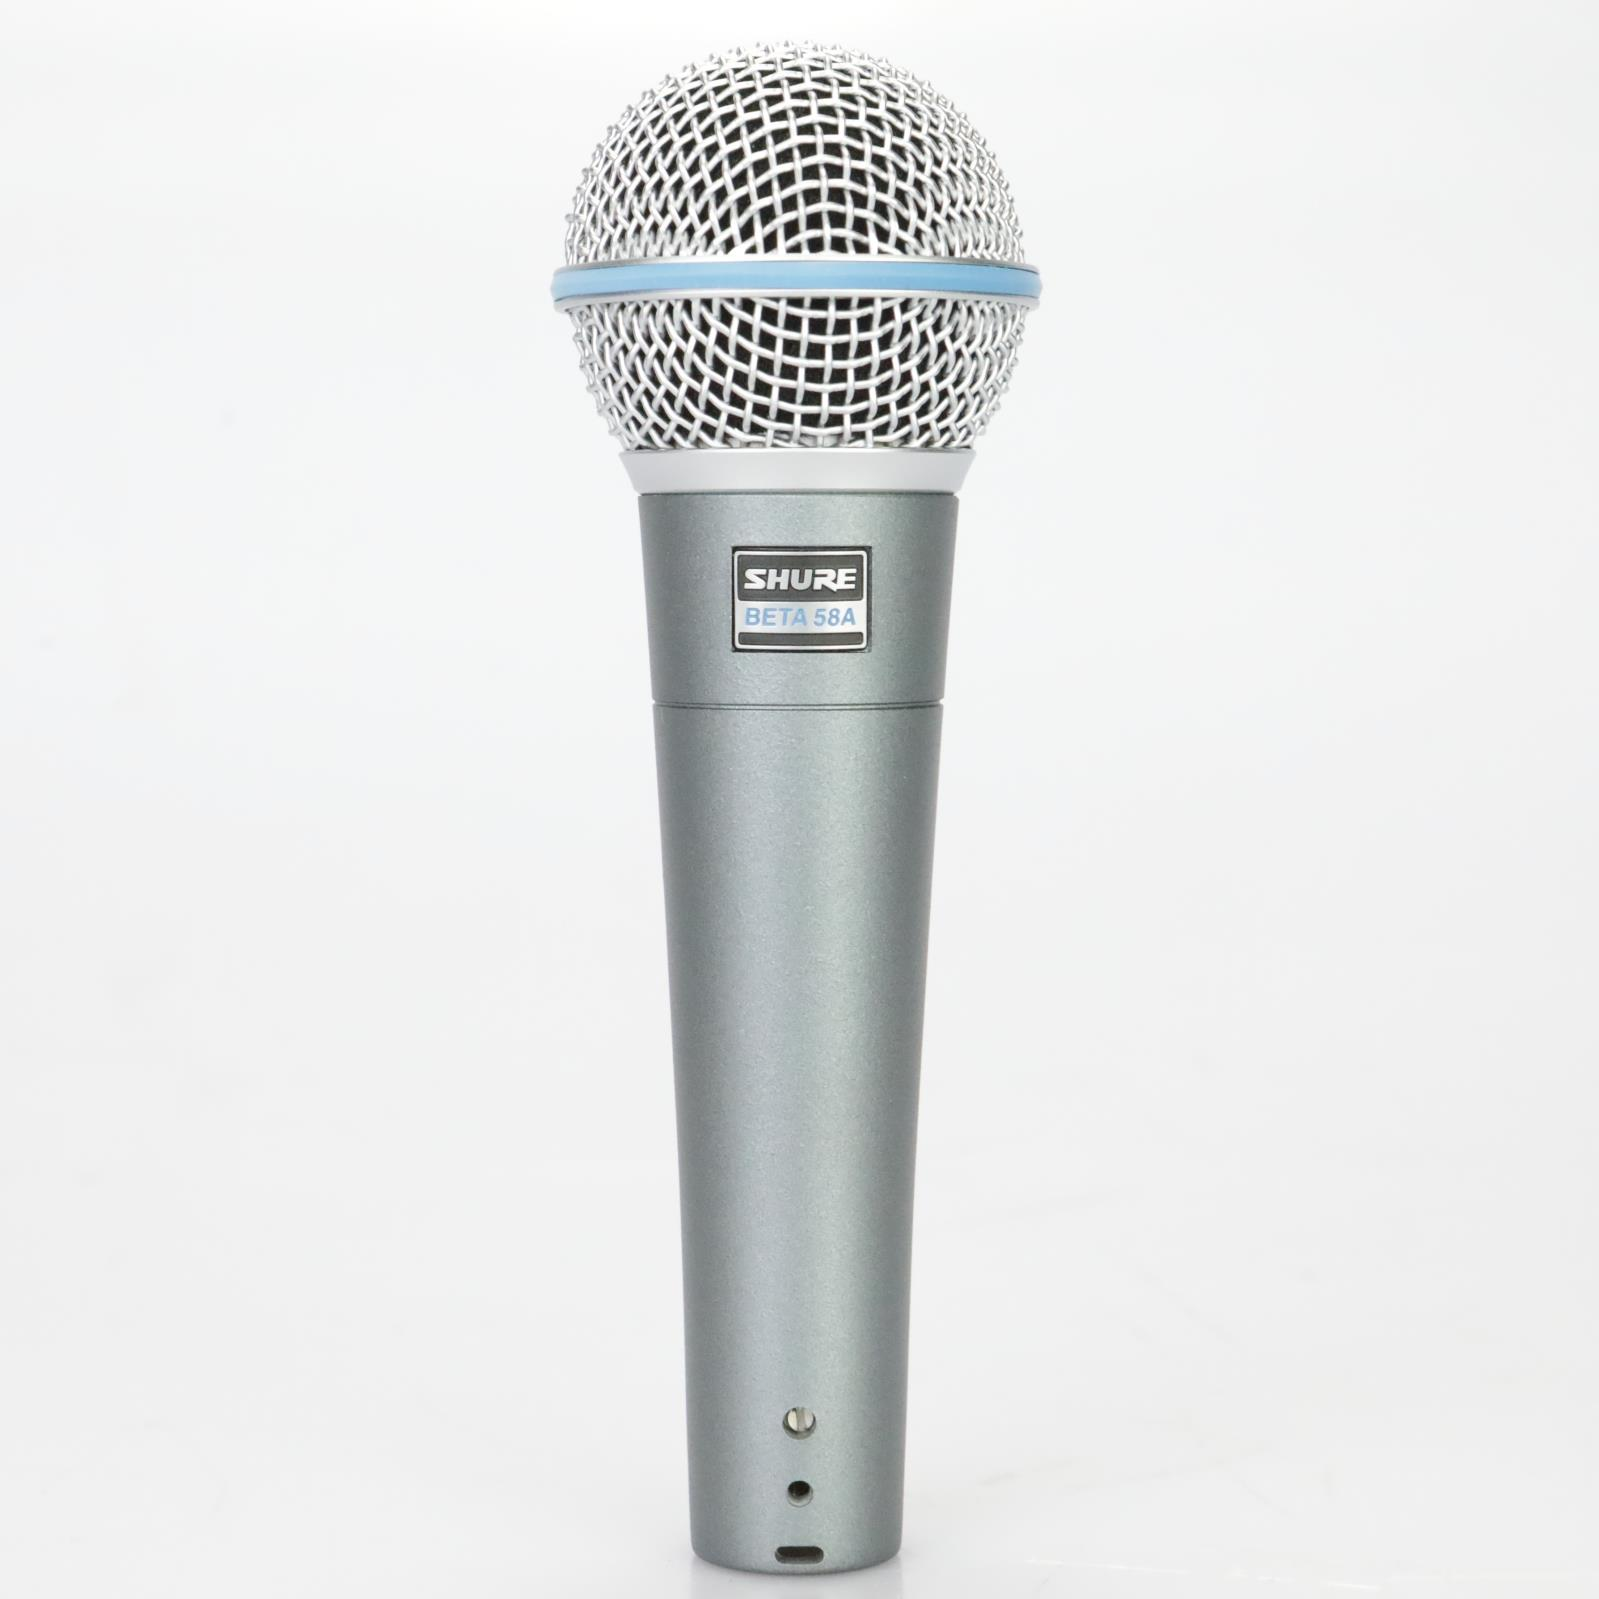 Shure Beta 58A Dynamic Mic Microphone w/ Box #39260